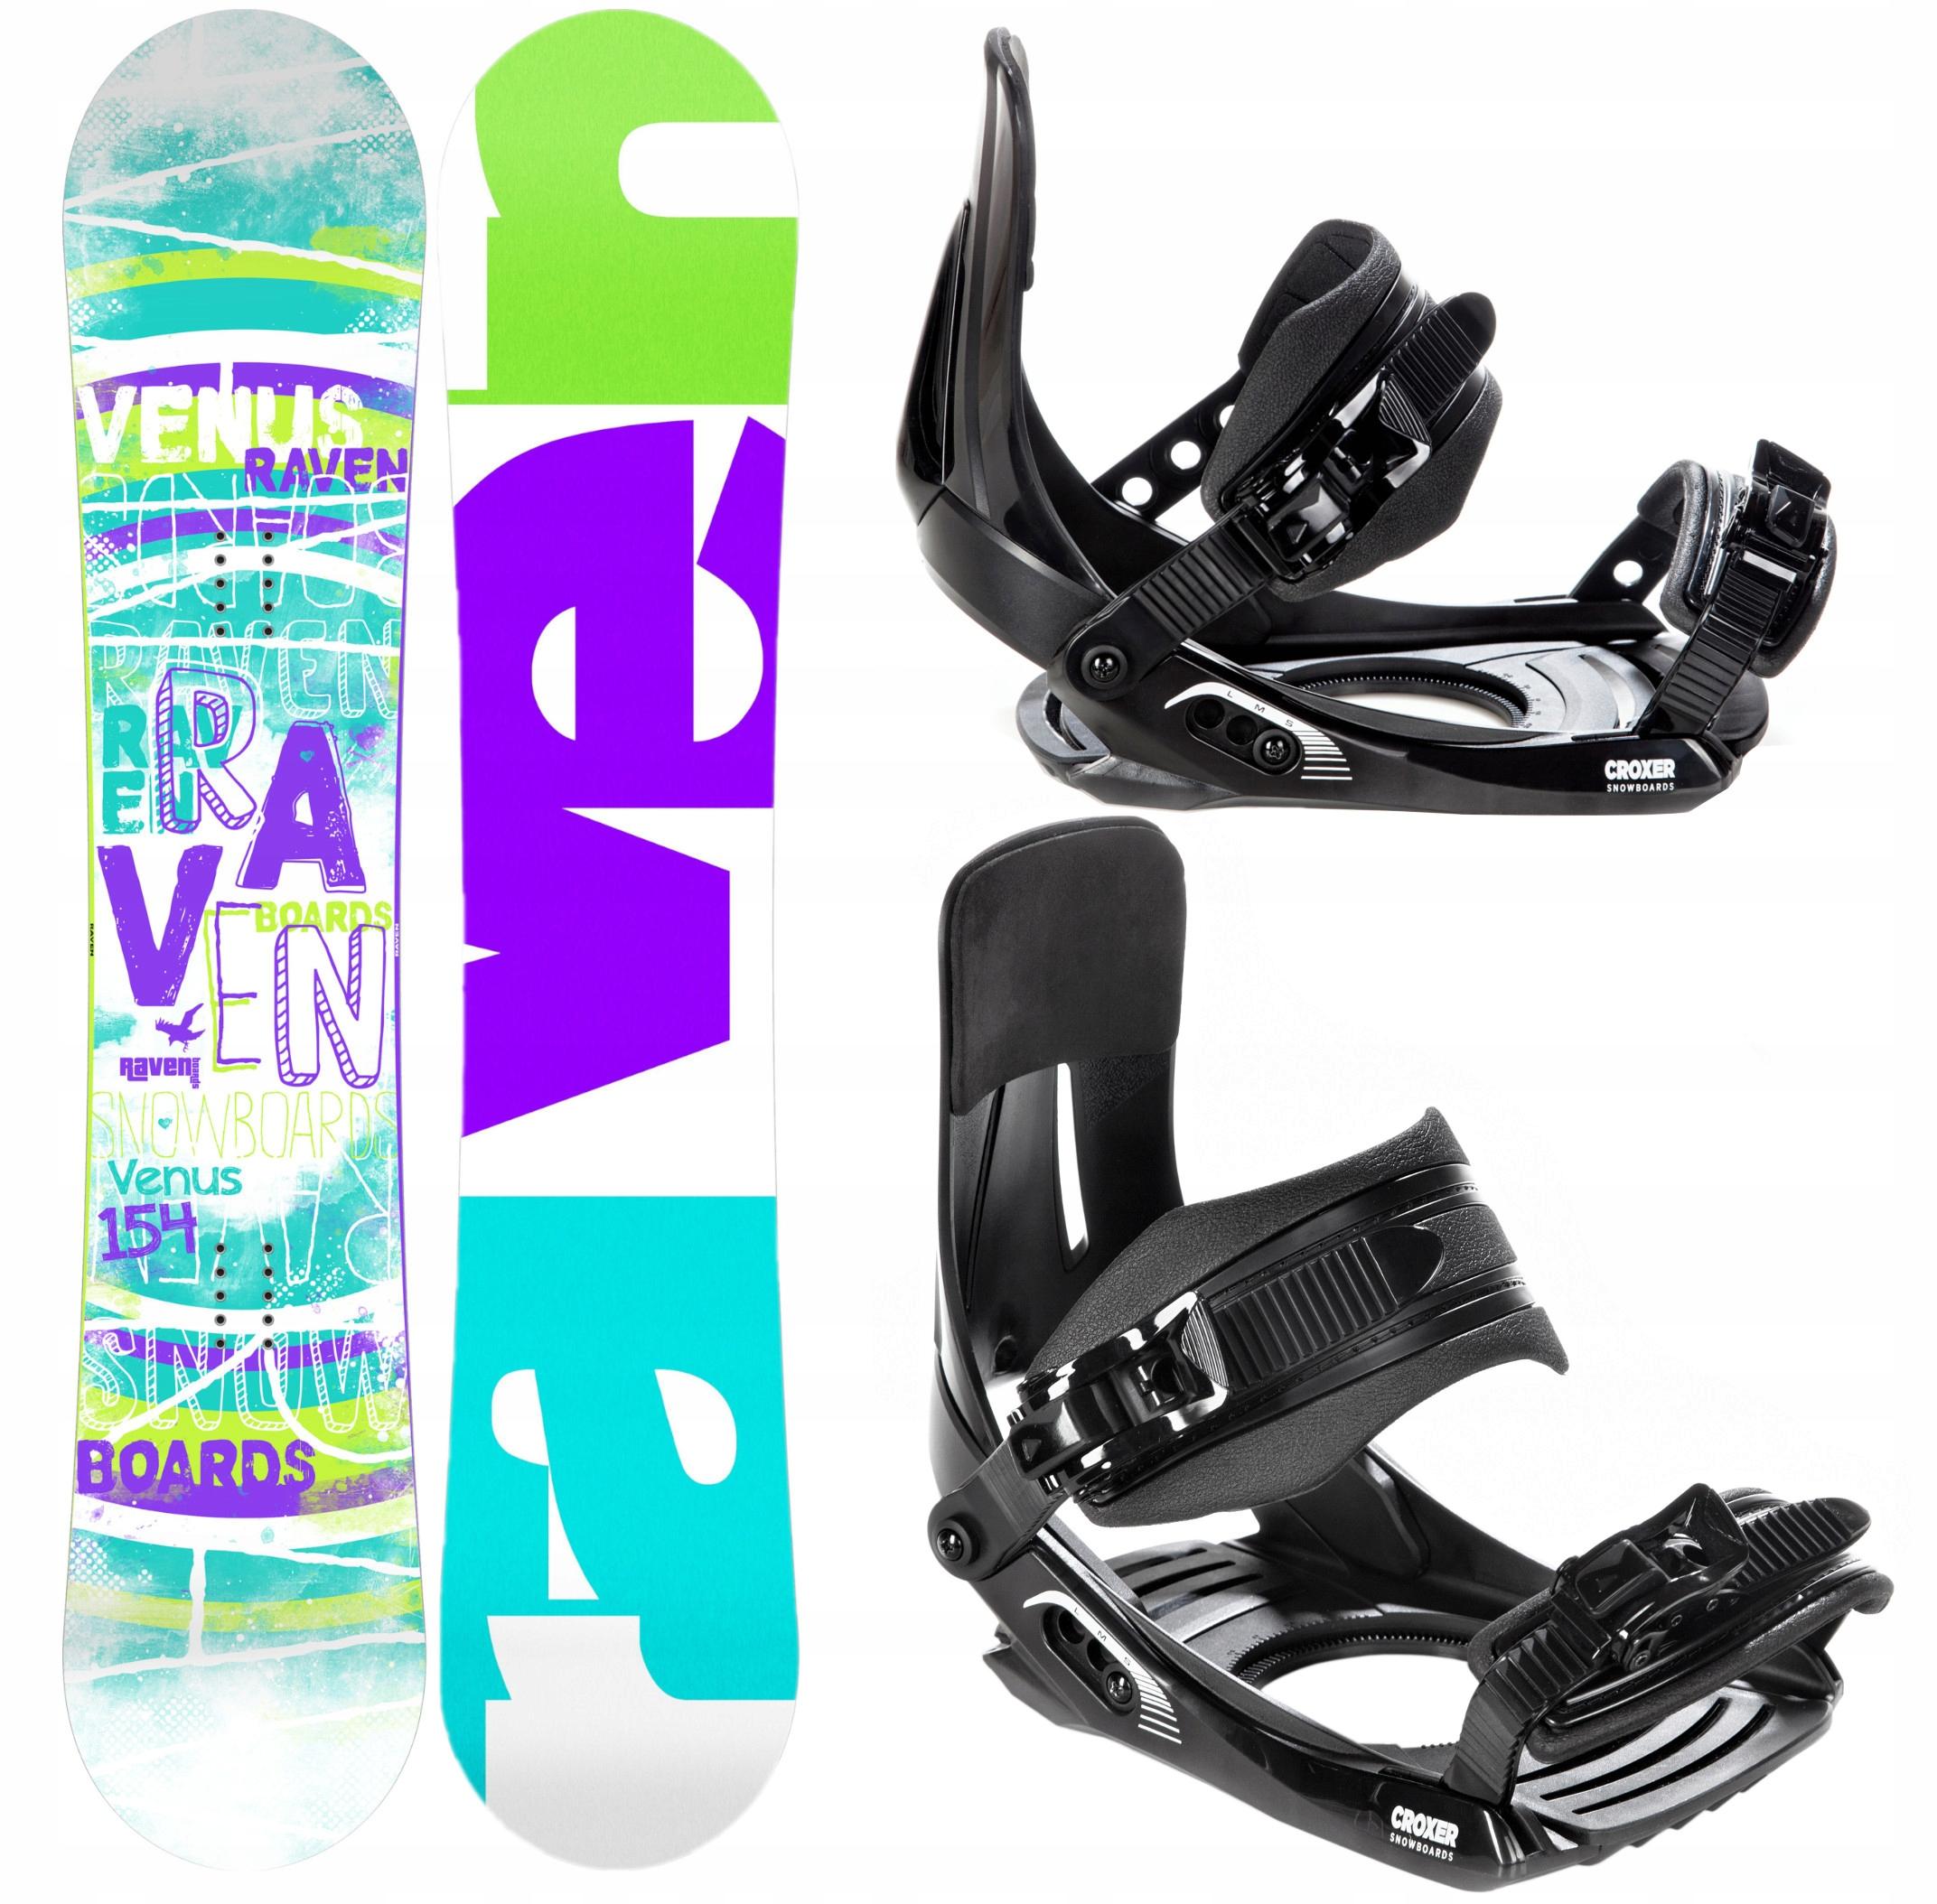 Snowboard RAVEN Venuša 147cm 2020 + záväzné Croxer